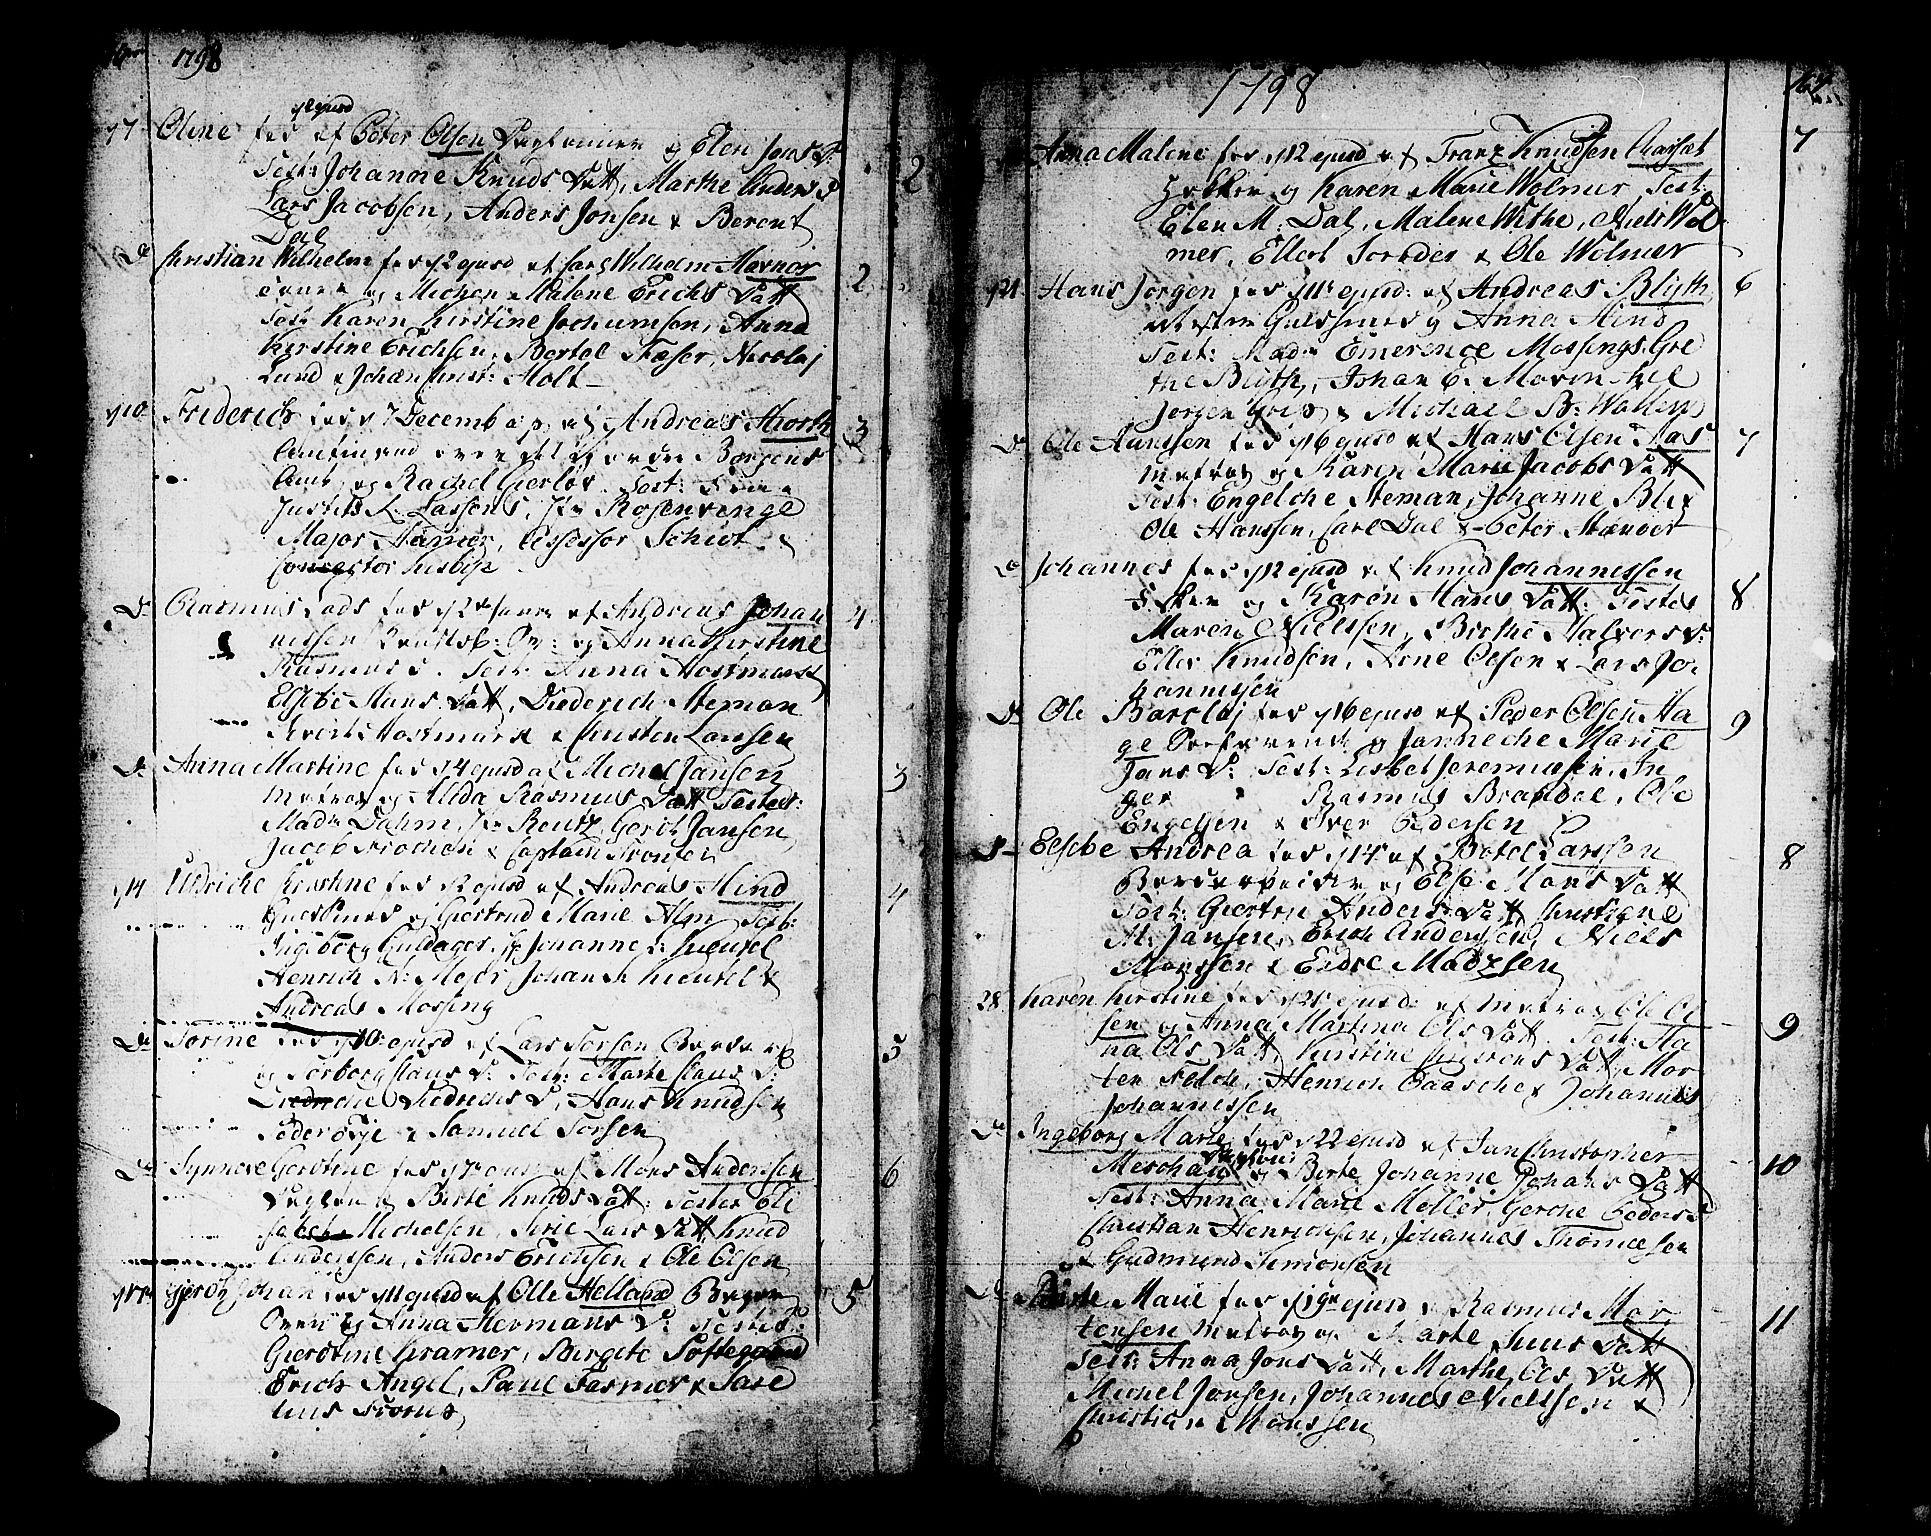 SAB, Domkirken sokneprestembete, H/Haa/L0004: Ministerialbok nr. A 4, 1763-1820, s. 166-167